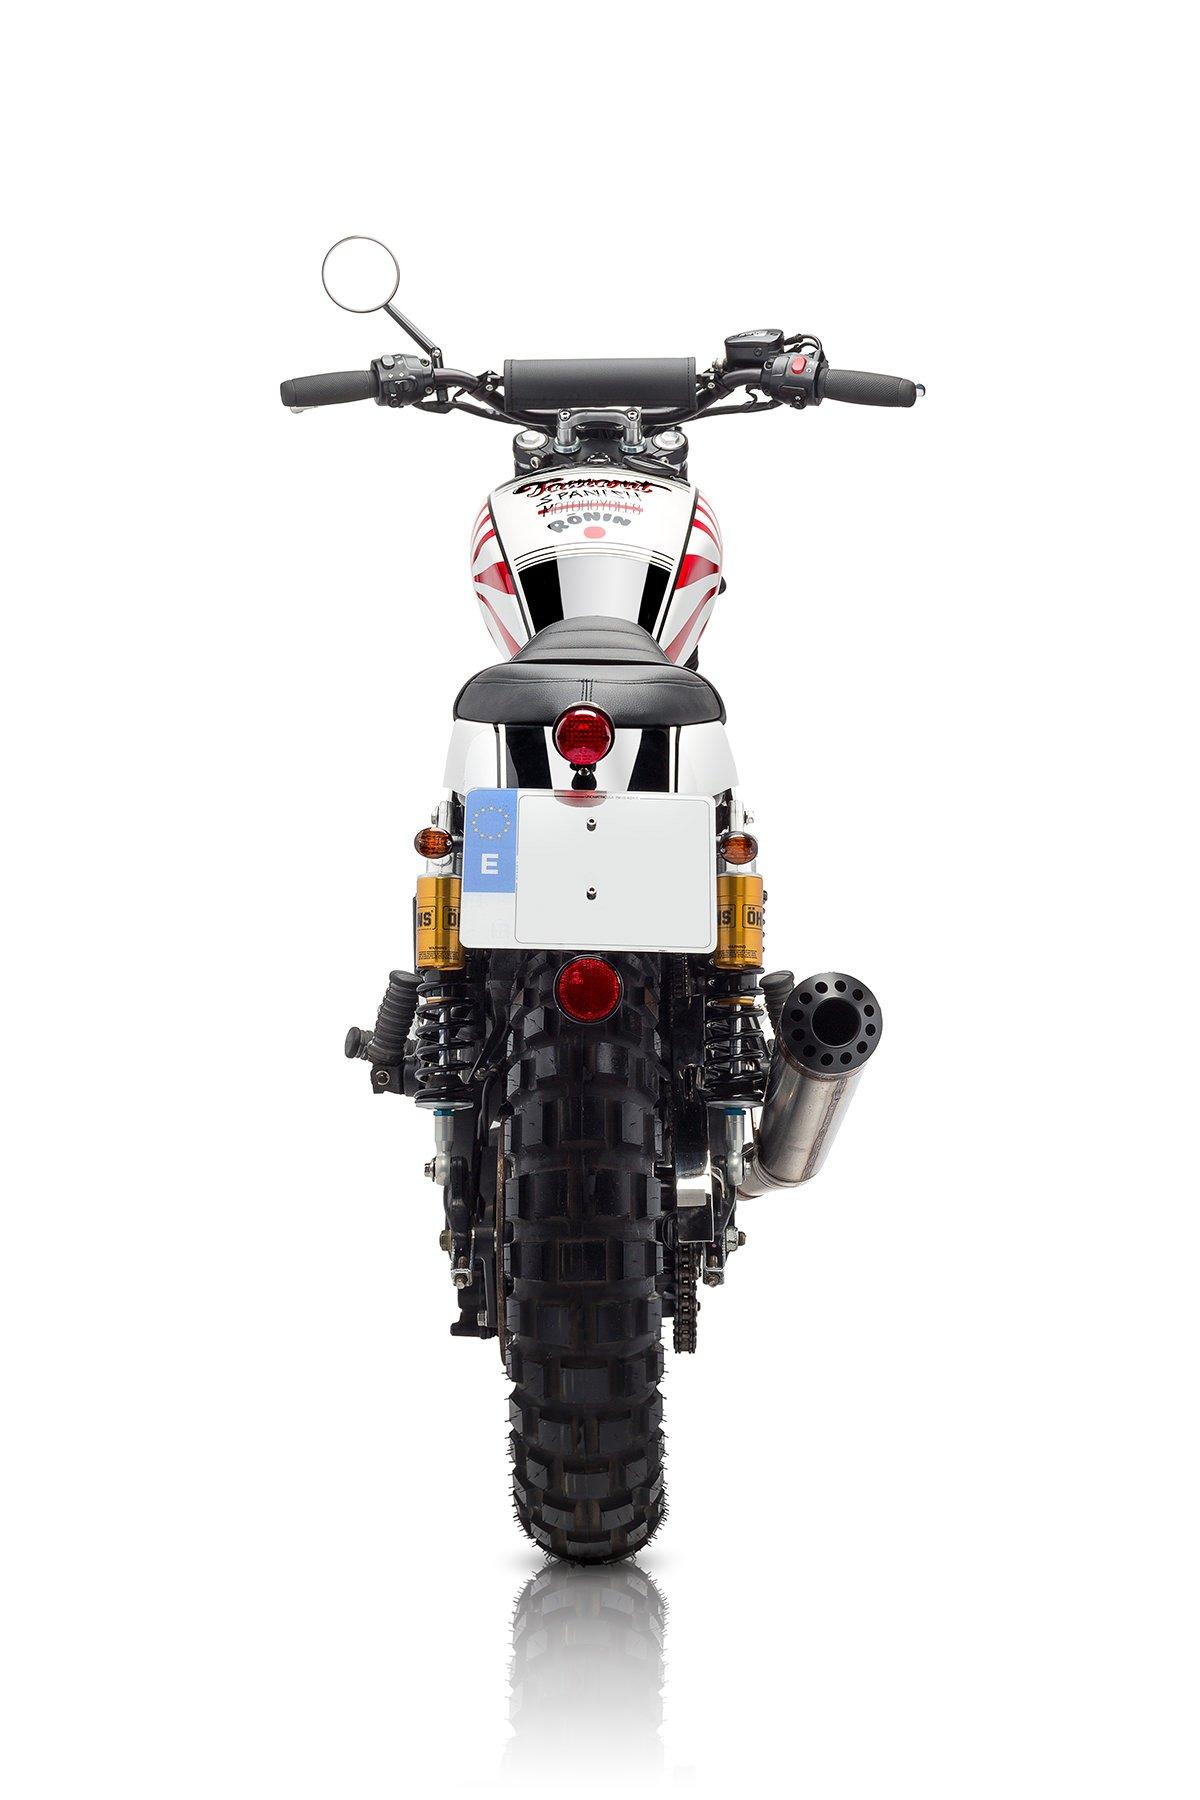 Custom Triumph Scrambler Motorcycle 13